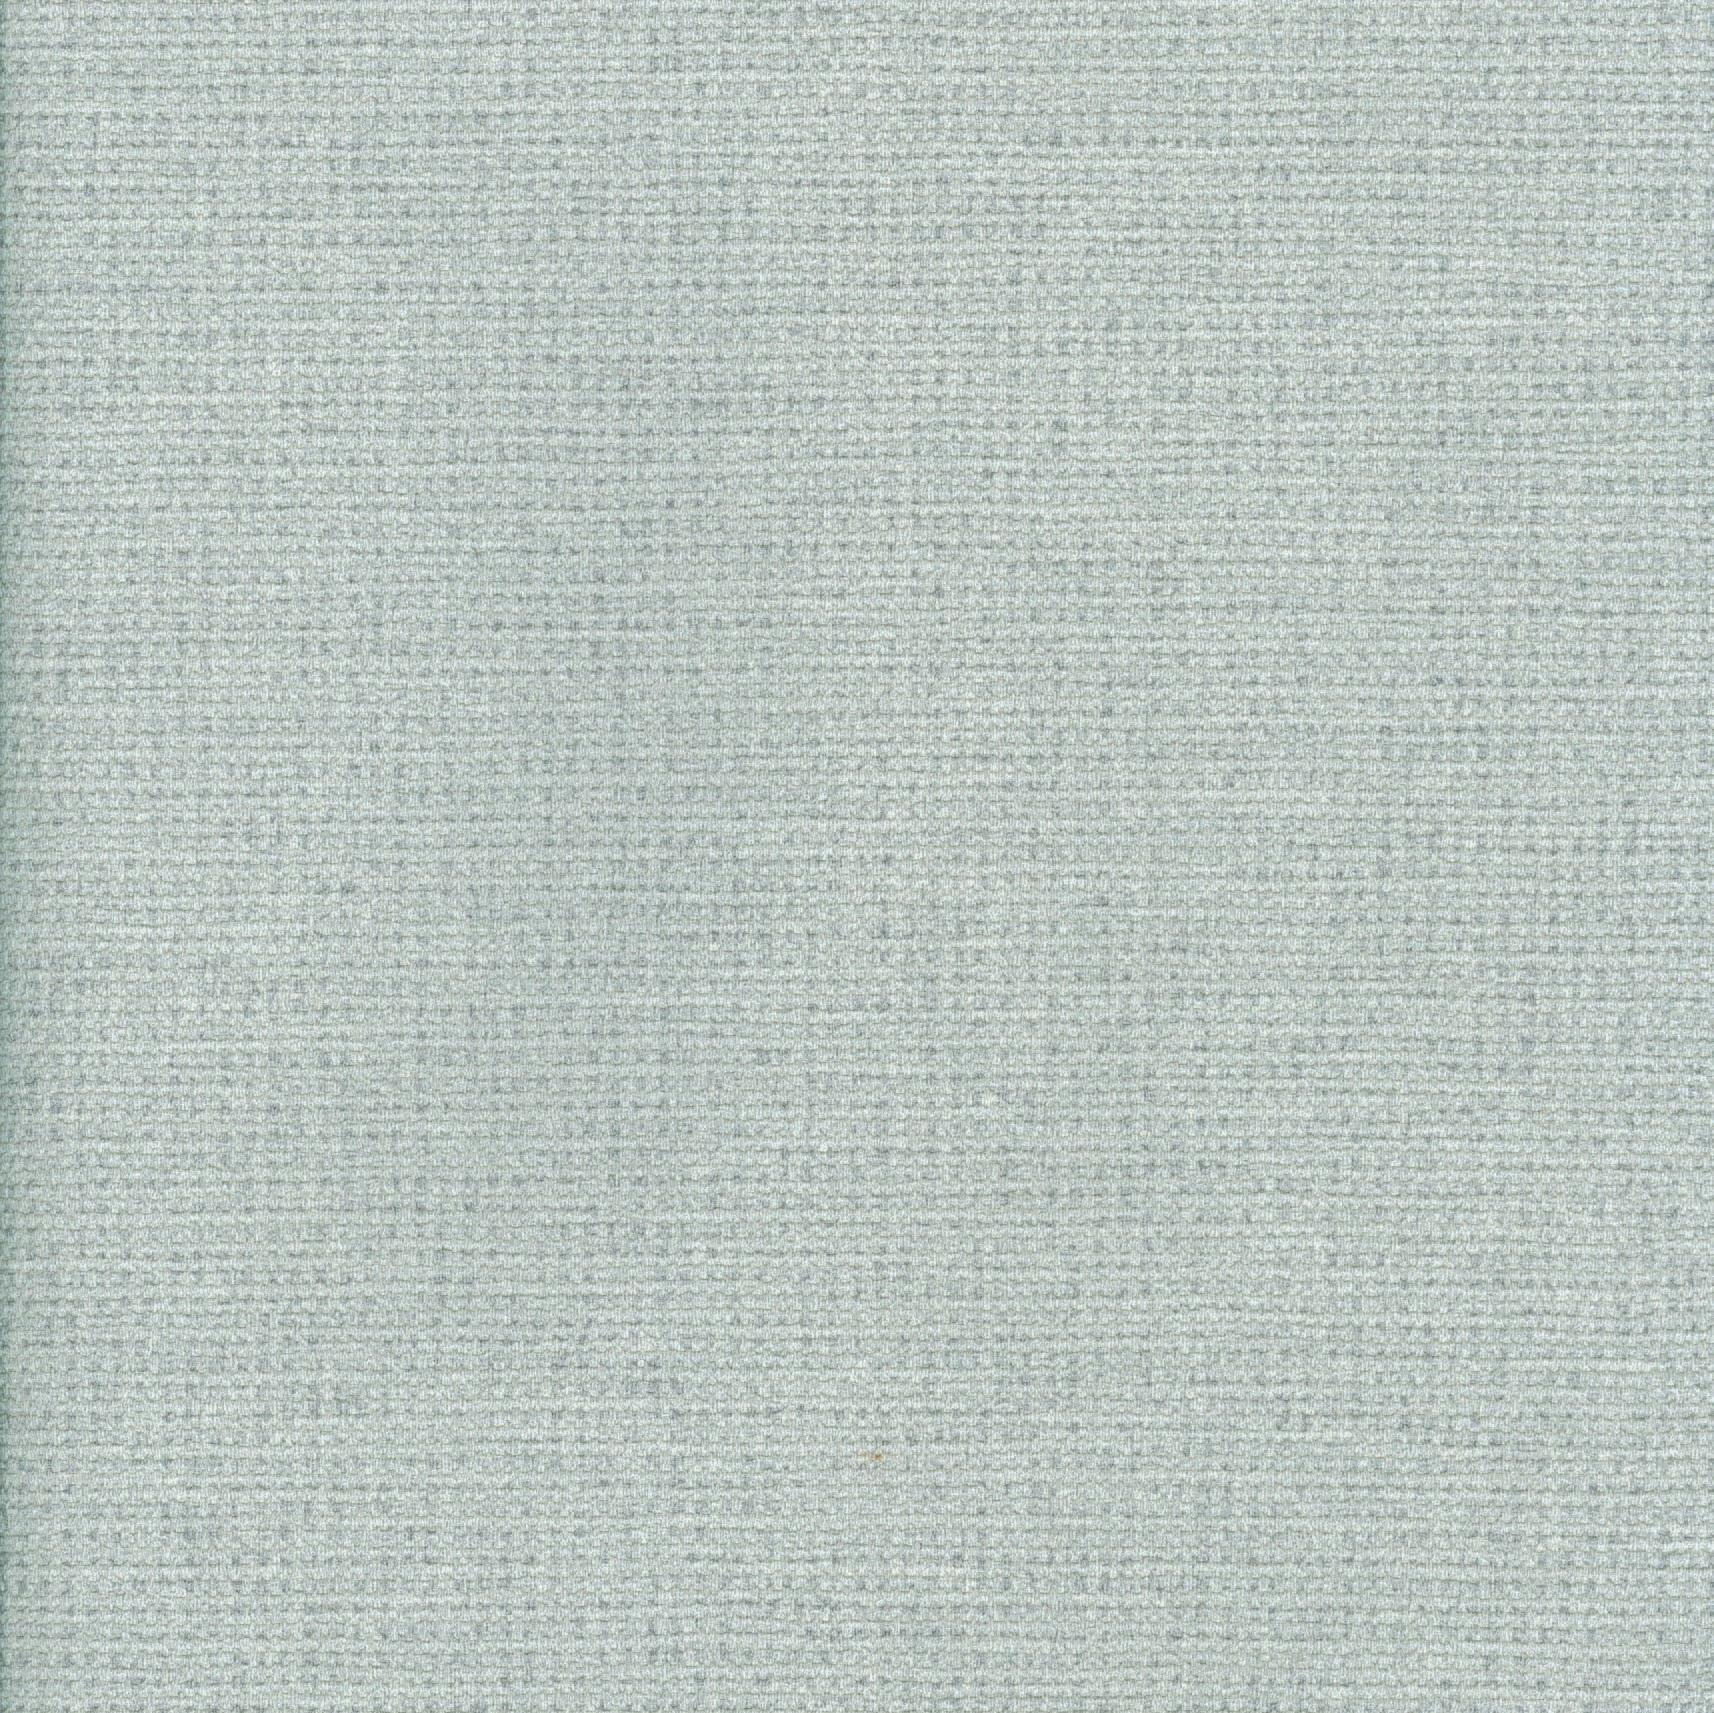 Papel de Parede Pure 2 Tramado 187501 - Rolo: 10m x 0,53m